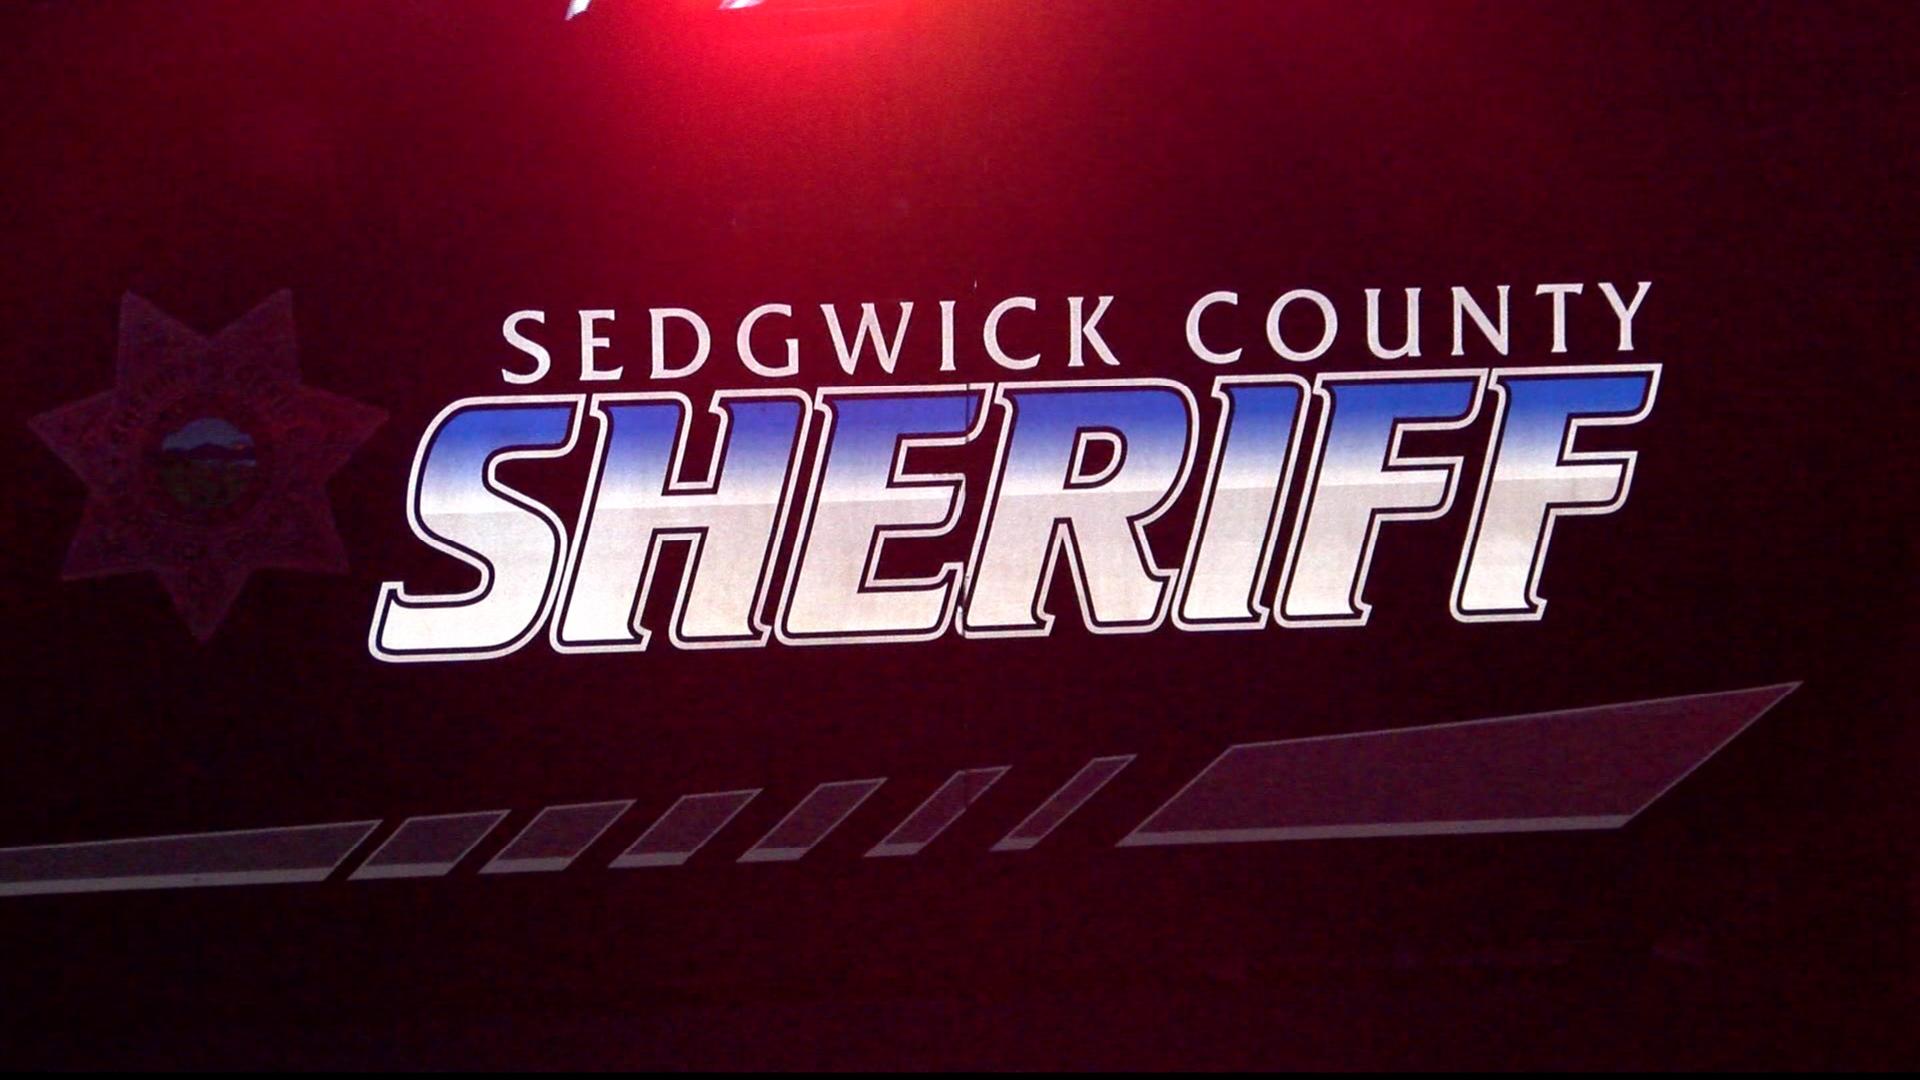 Sedgwick County Sheriff.jpg